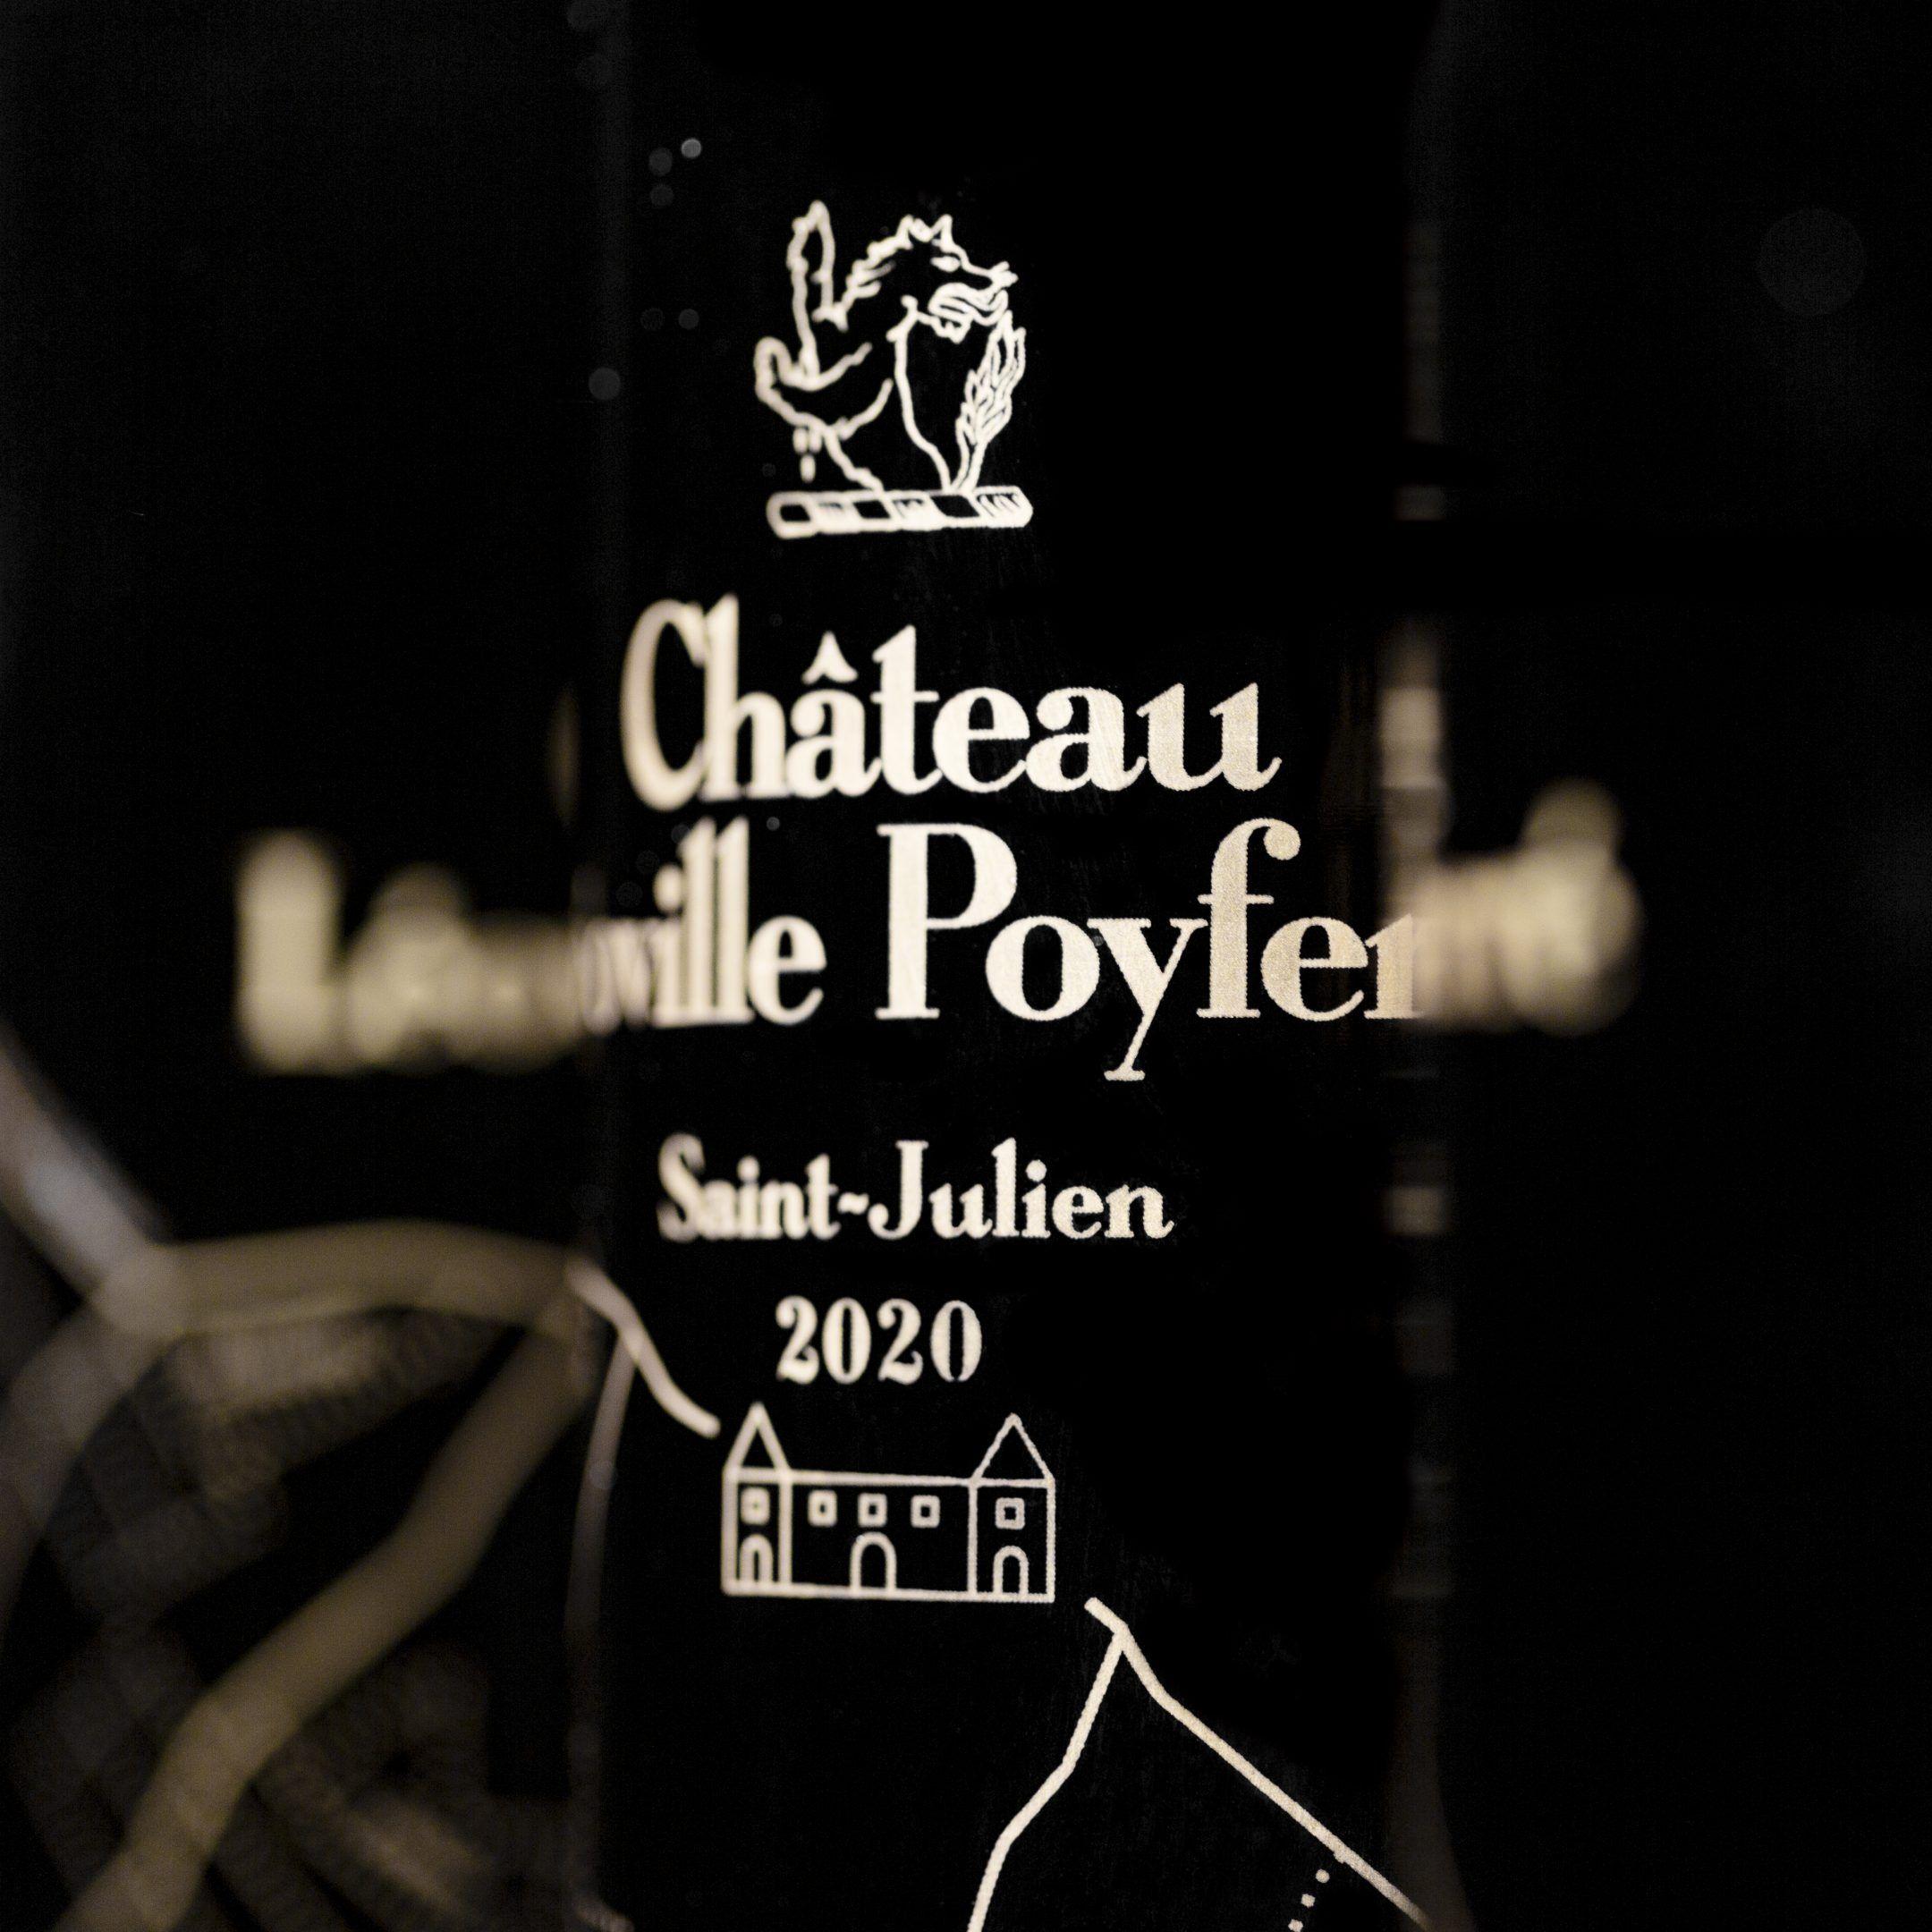 Chateau Léoville Poyferré 2020: a century for the Cuveliers - Léoville Poyferré